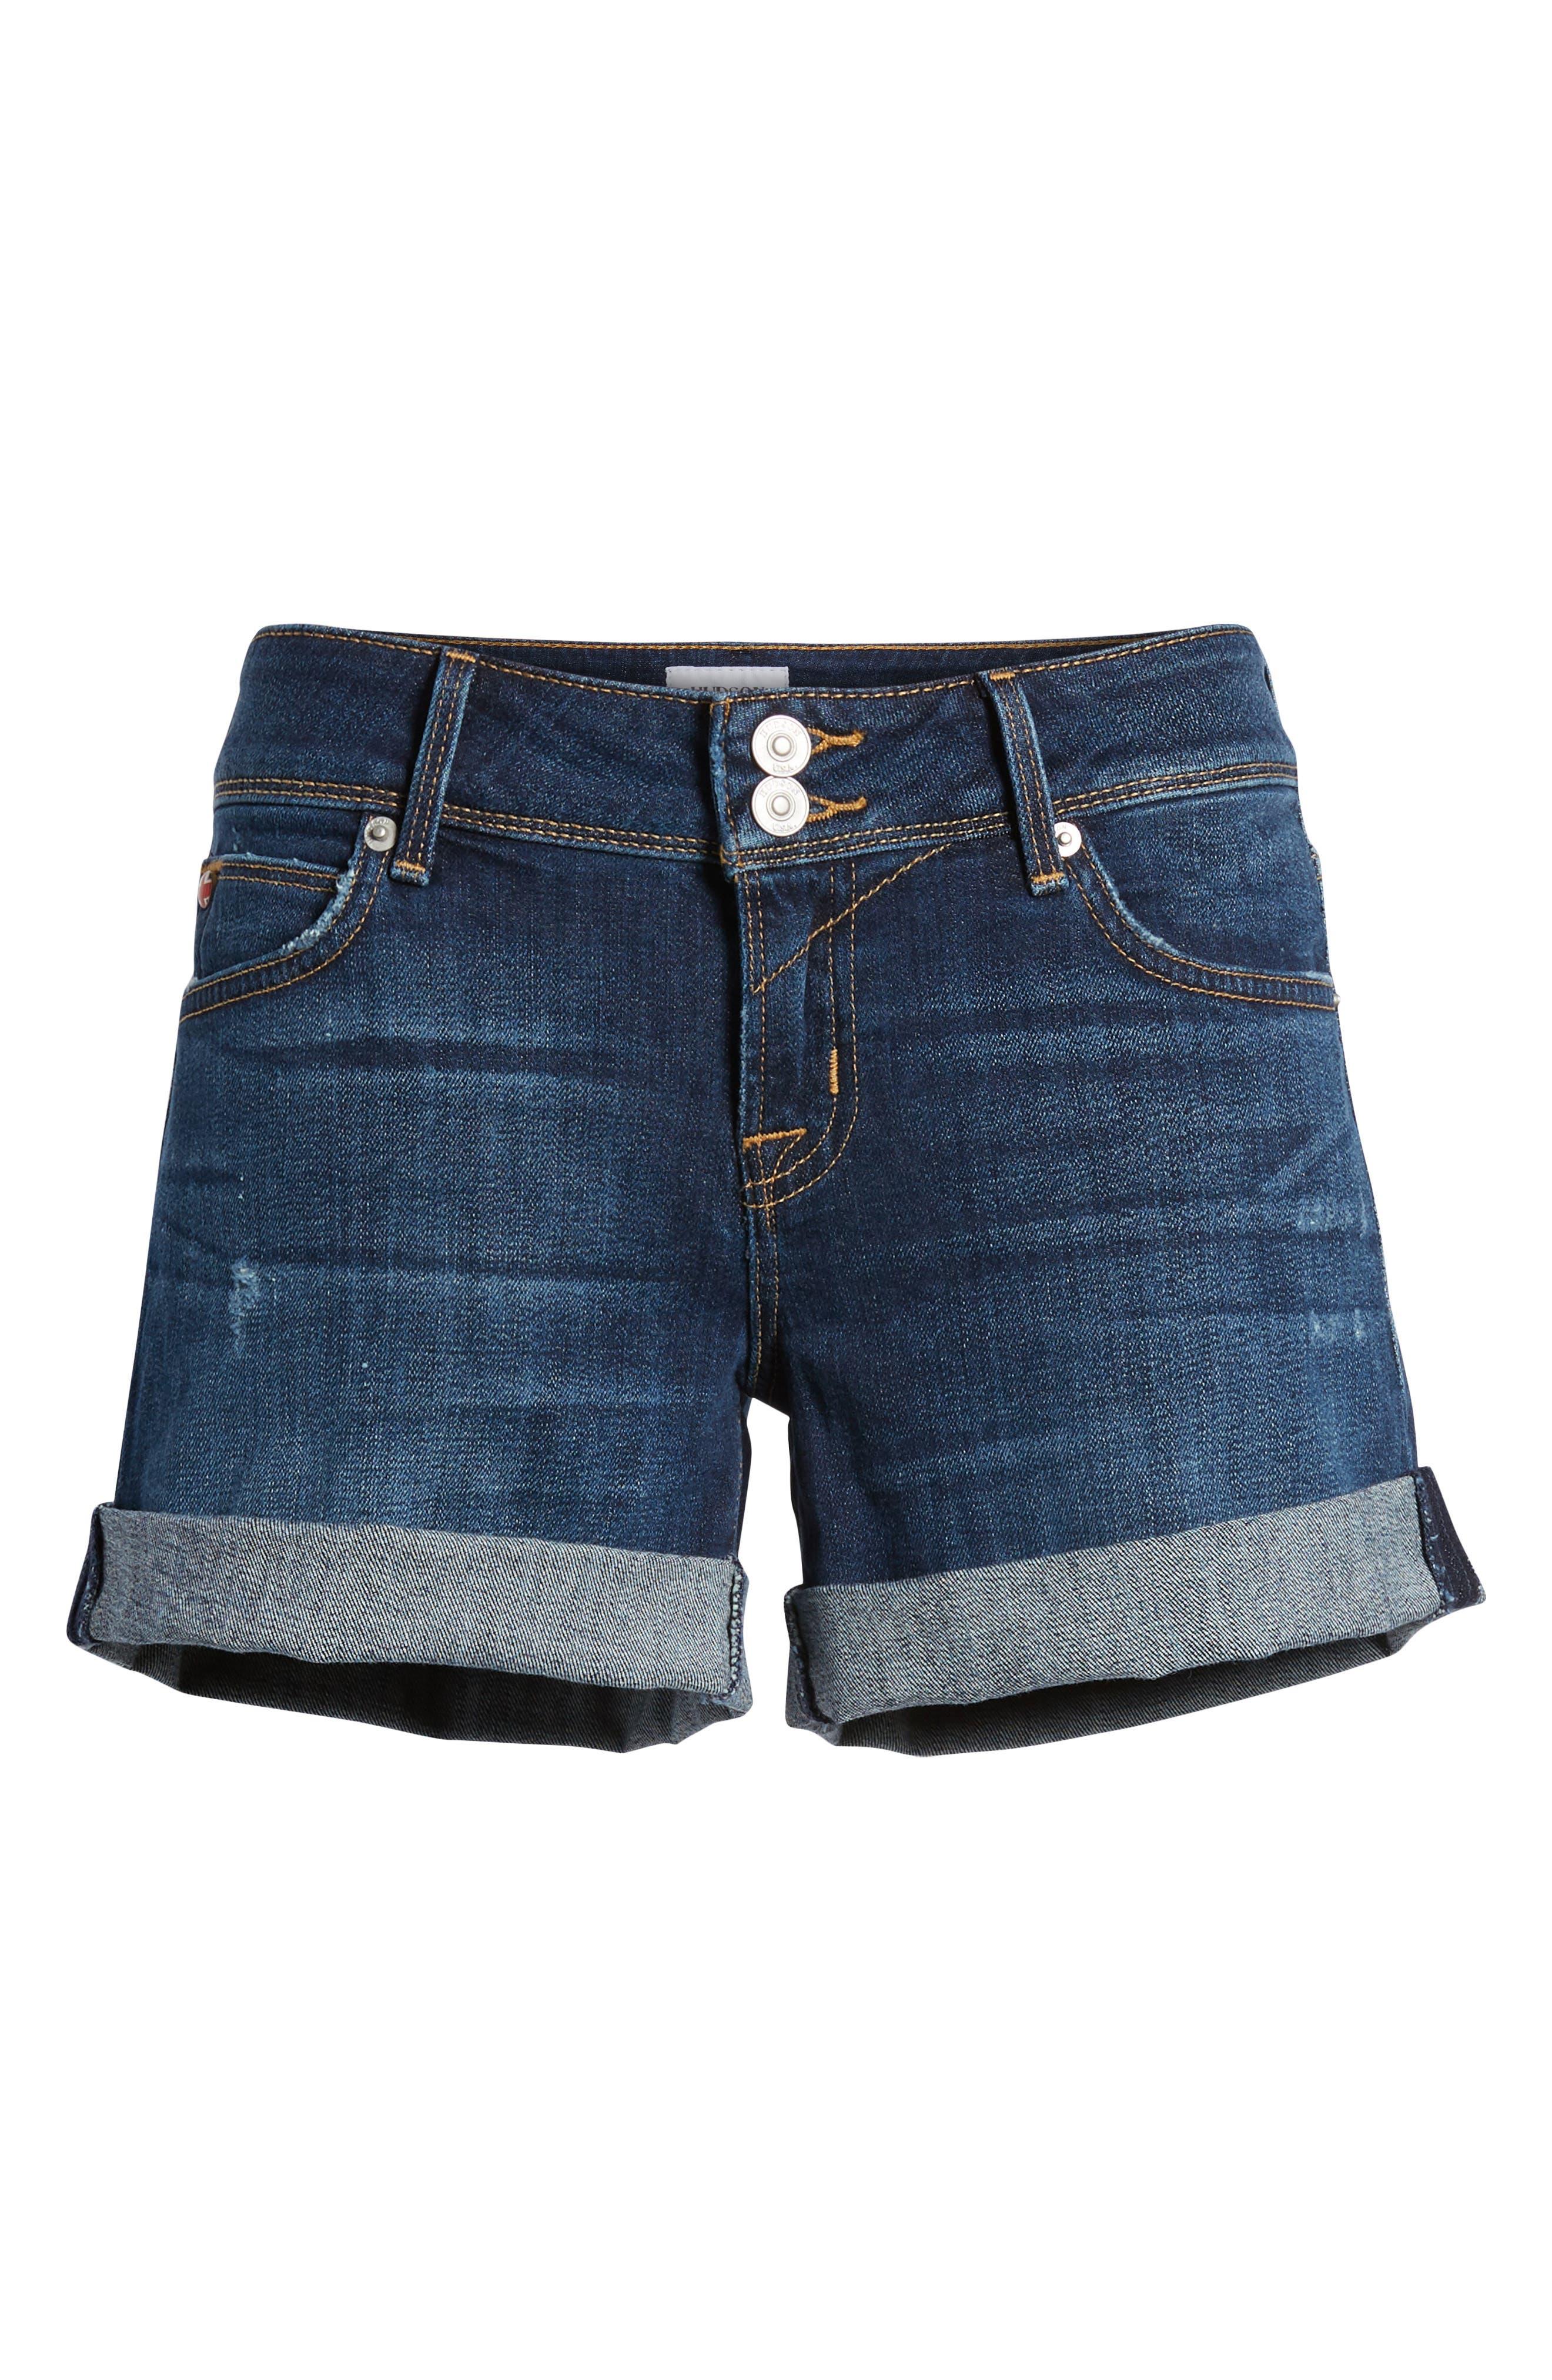 Croxley Cuffed Denim Shorts,                             Alternate thumbnail 7, color,                             423